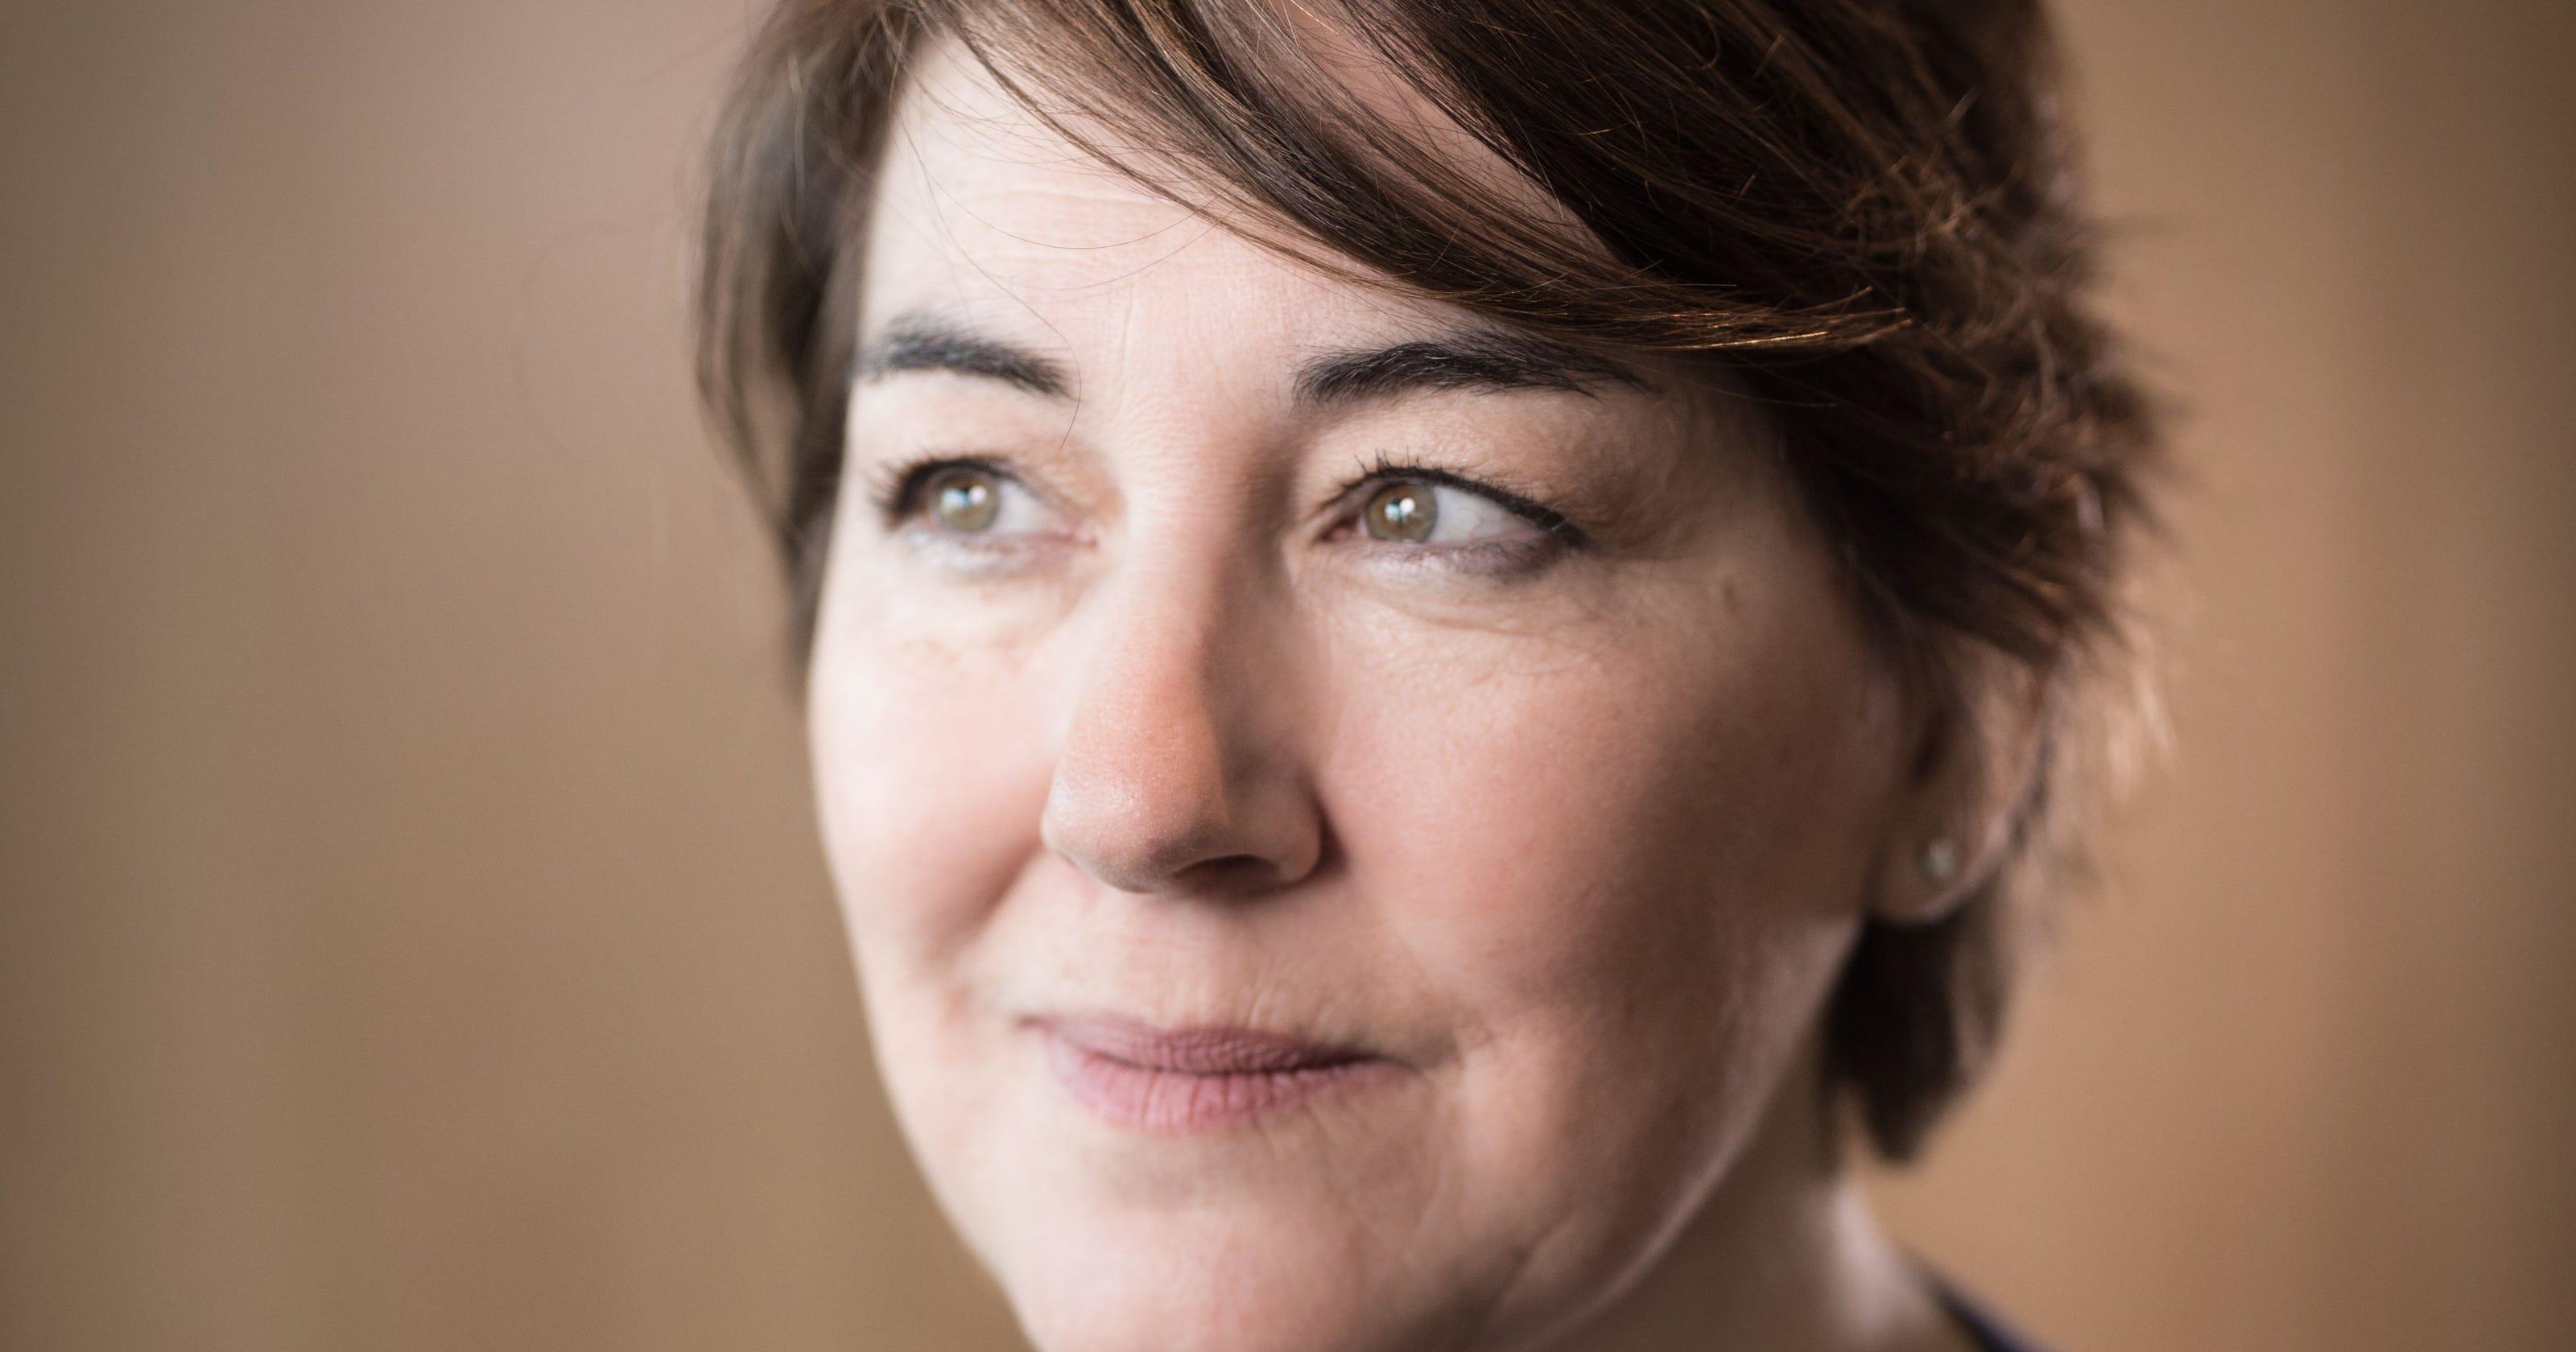 Ex-Pinterest COO sues company, alleging gender discrimination